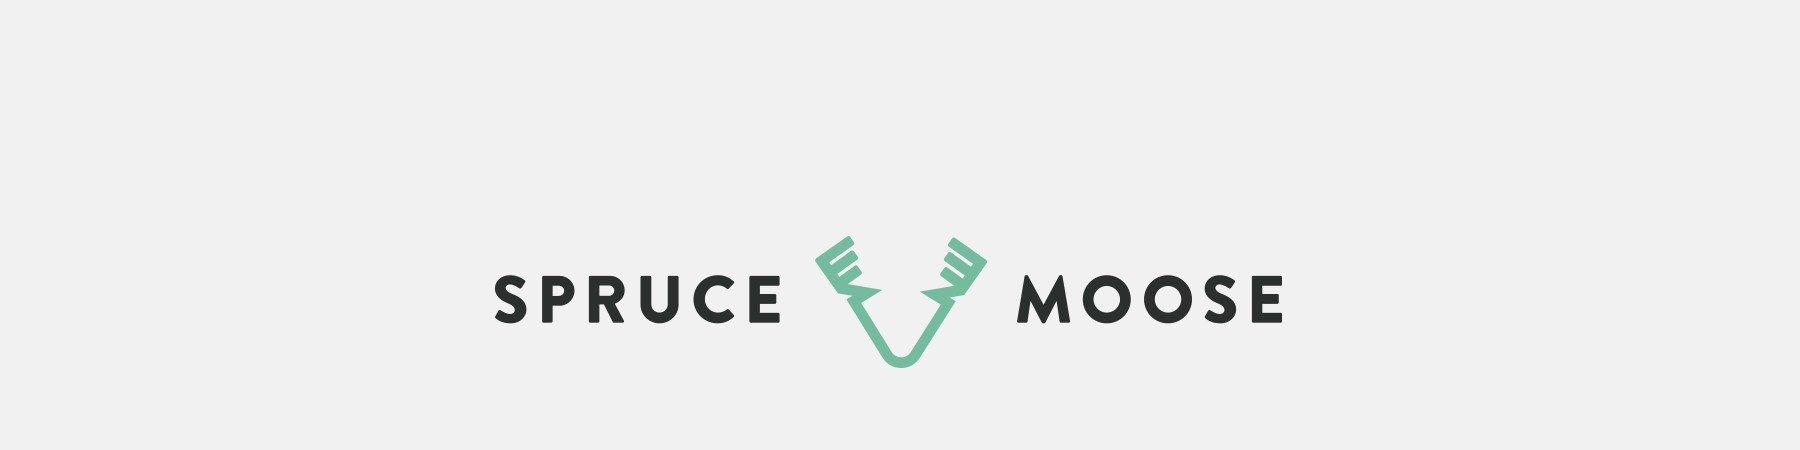 Spruce Moose Logo